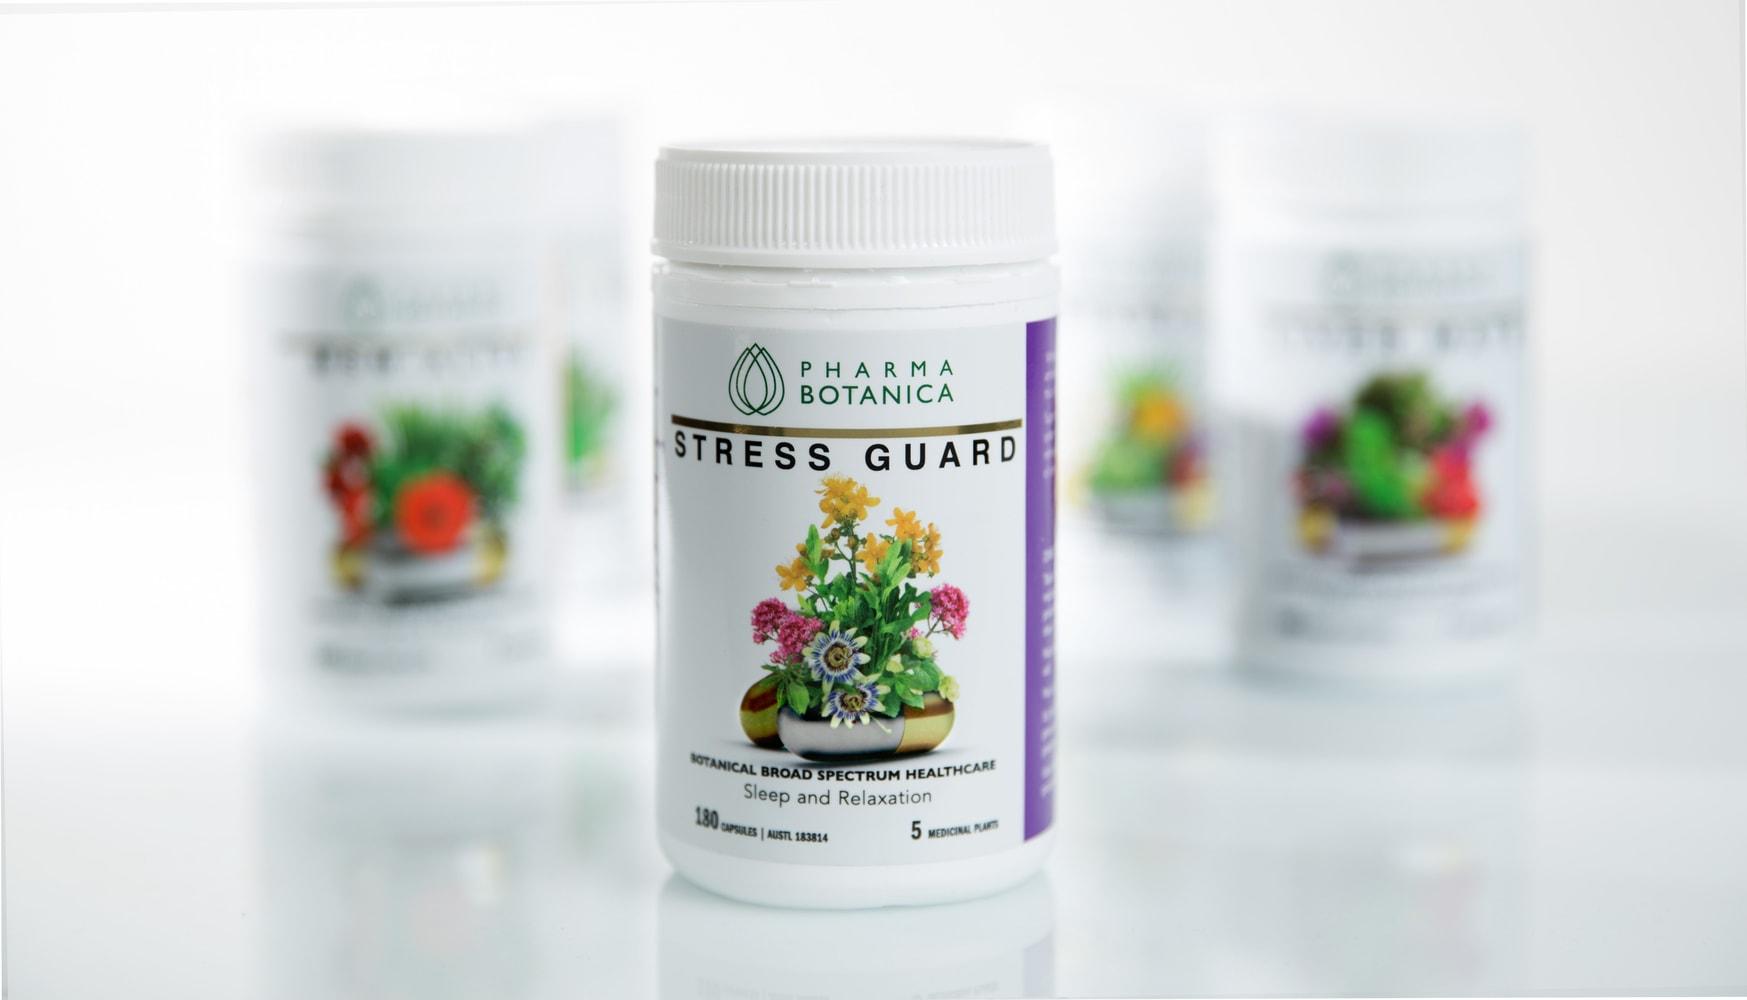 passiflora stress